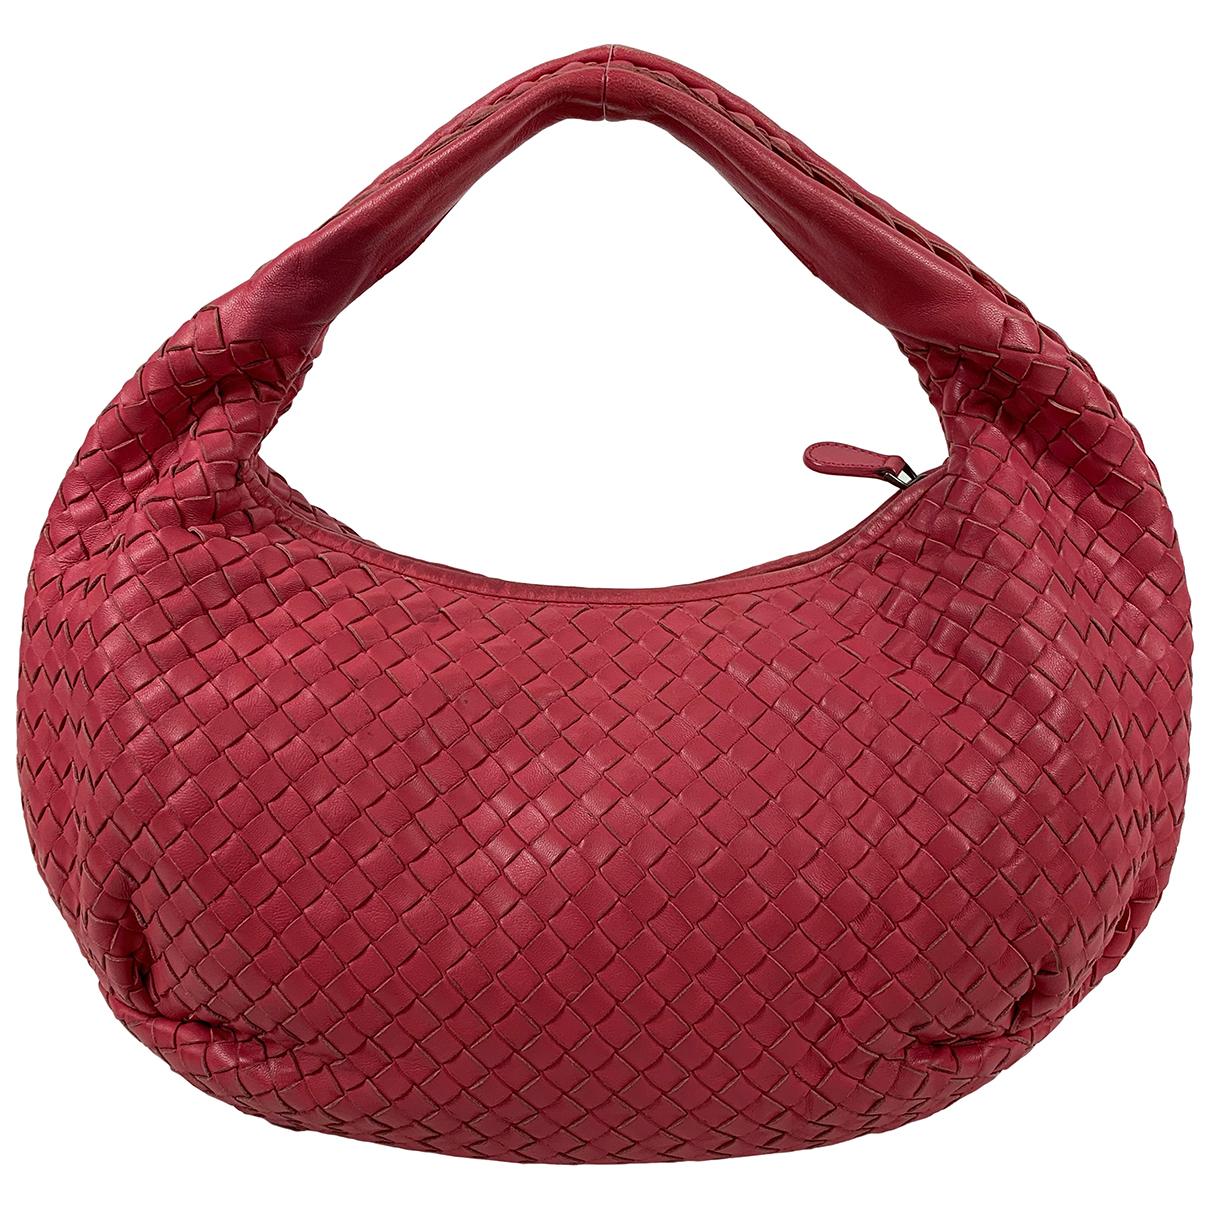 Bottega Veneta Veneta Pink Leather handbag for Women \N